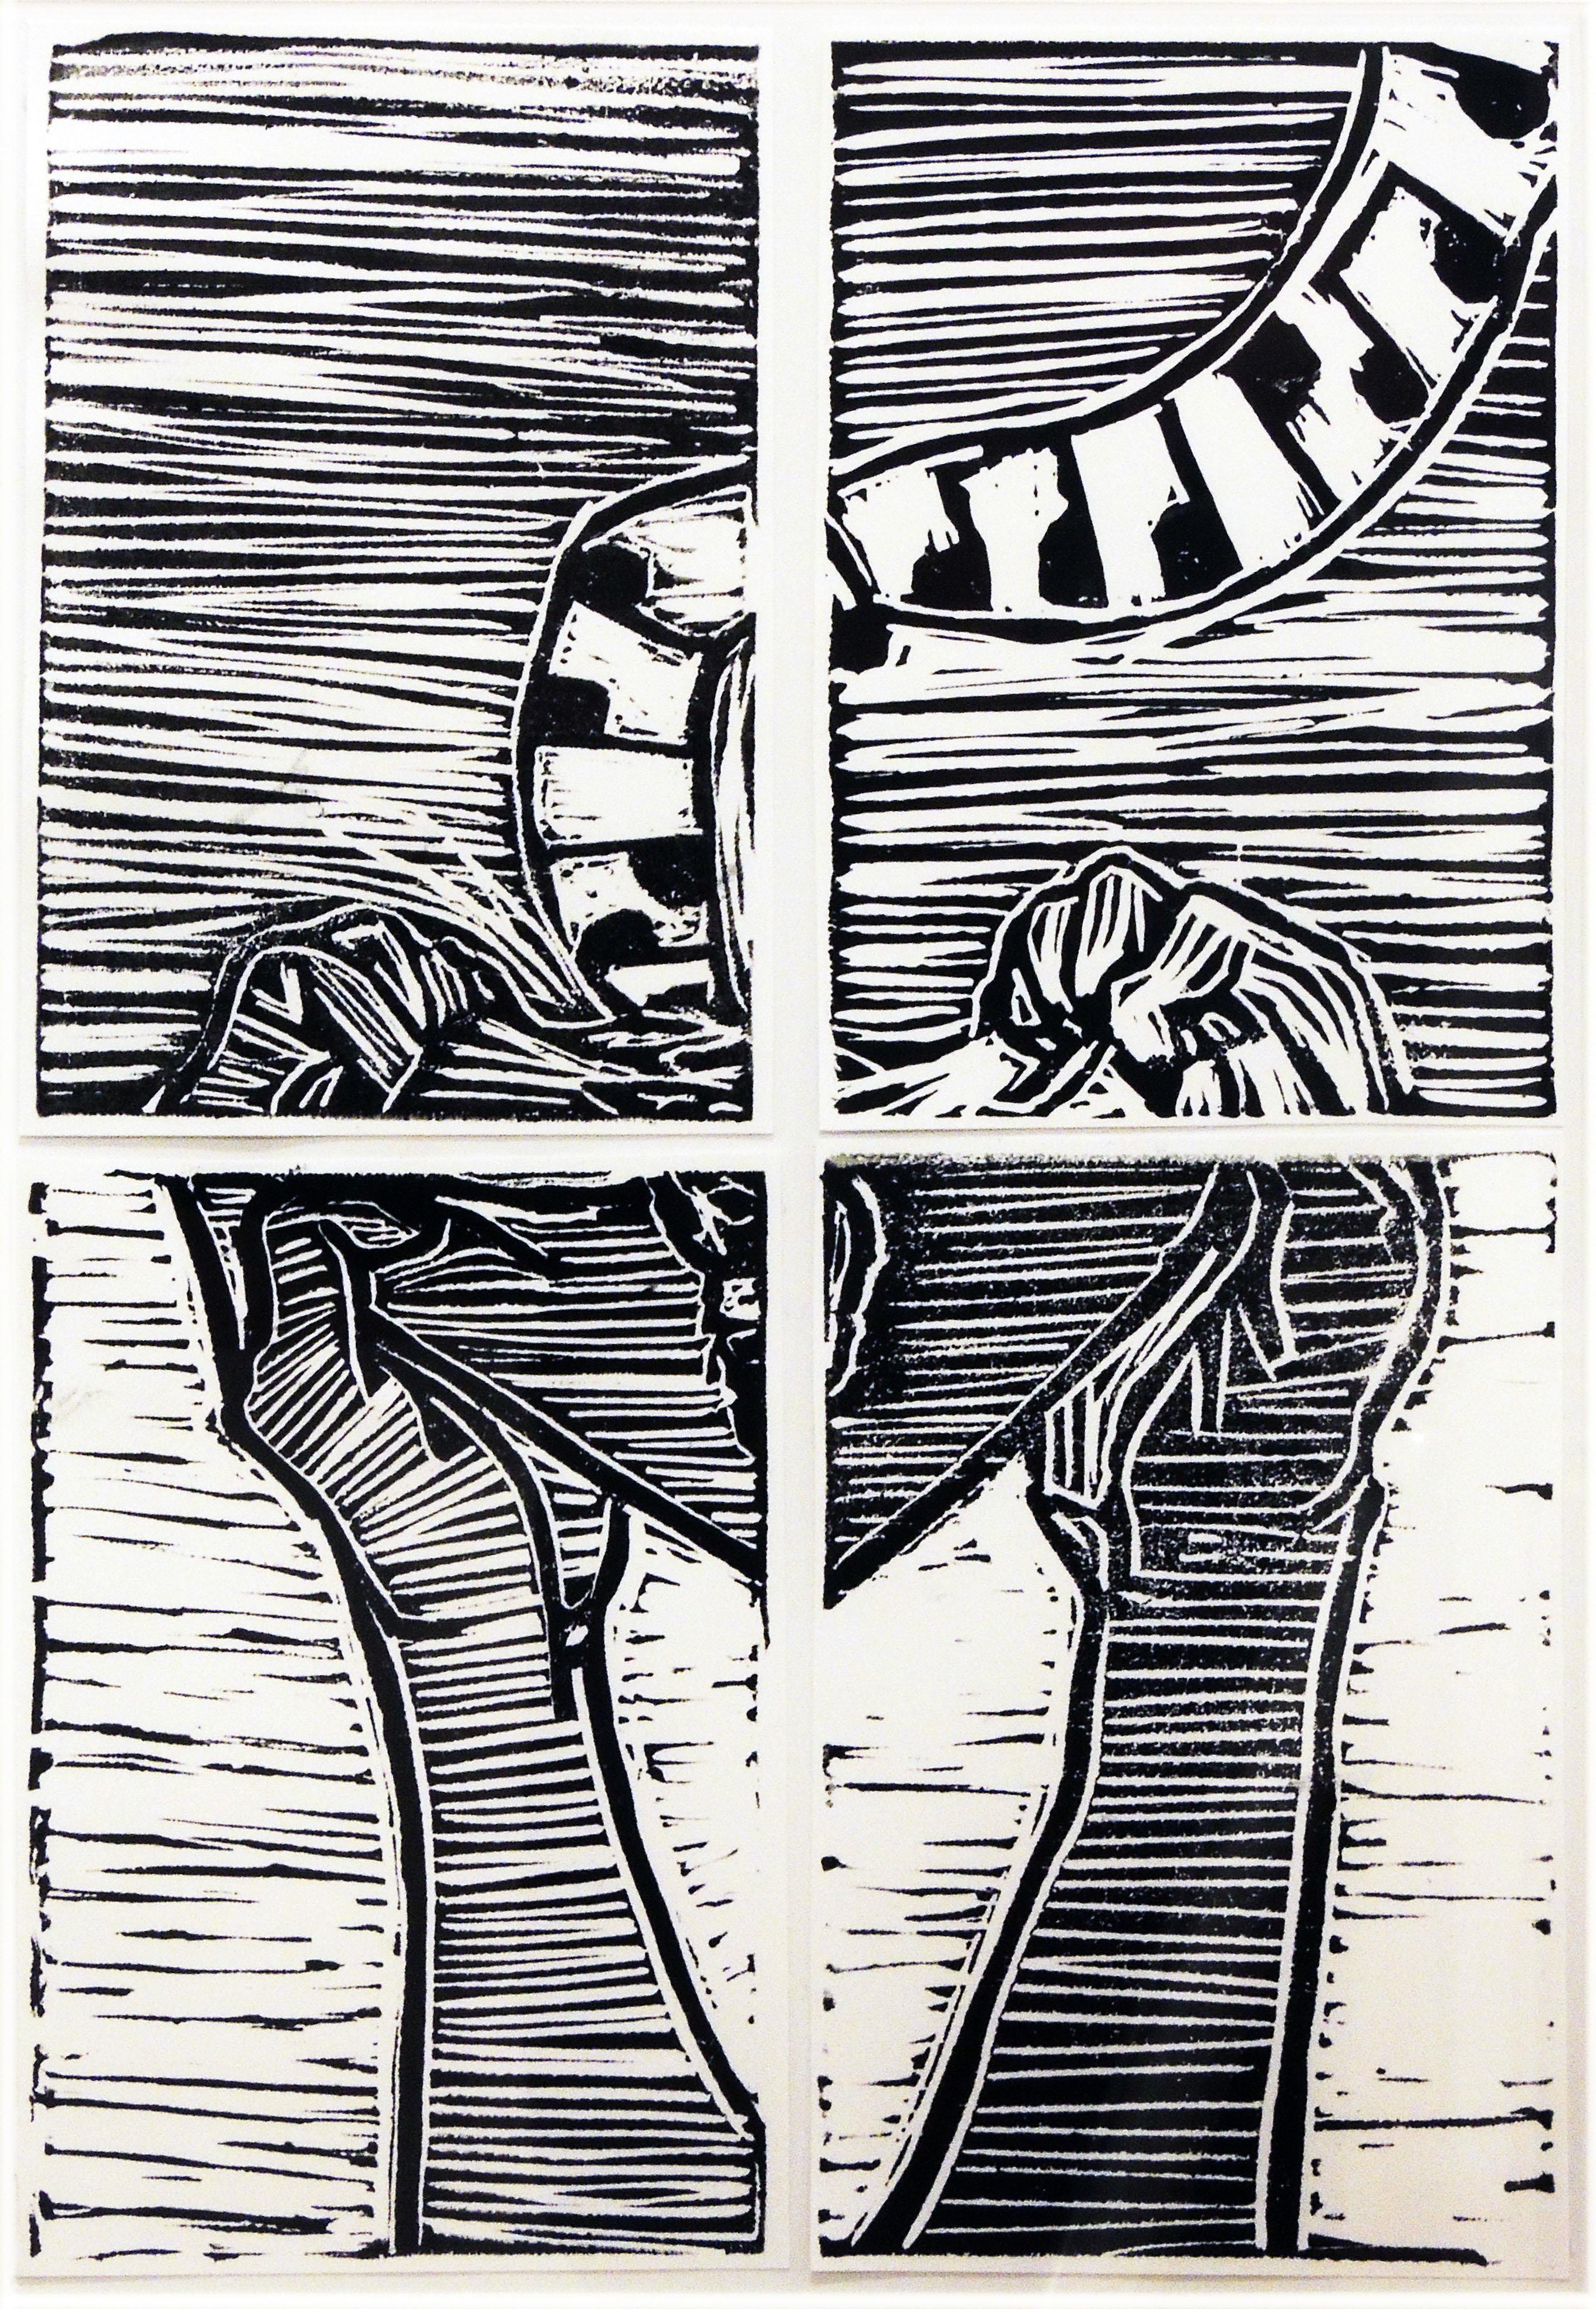 Anna Carney | BROKEN | relief print